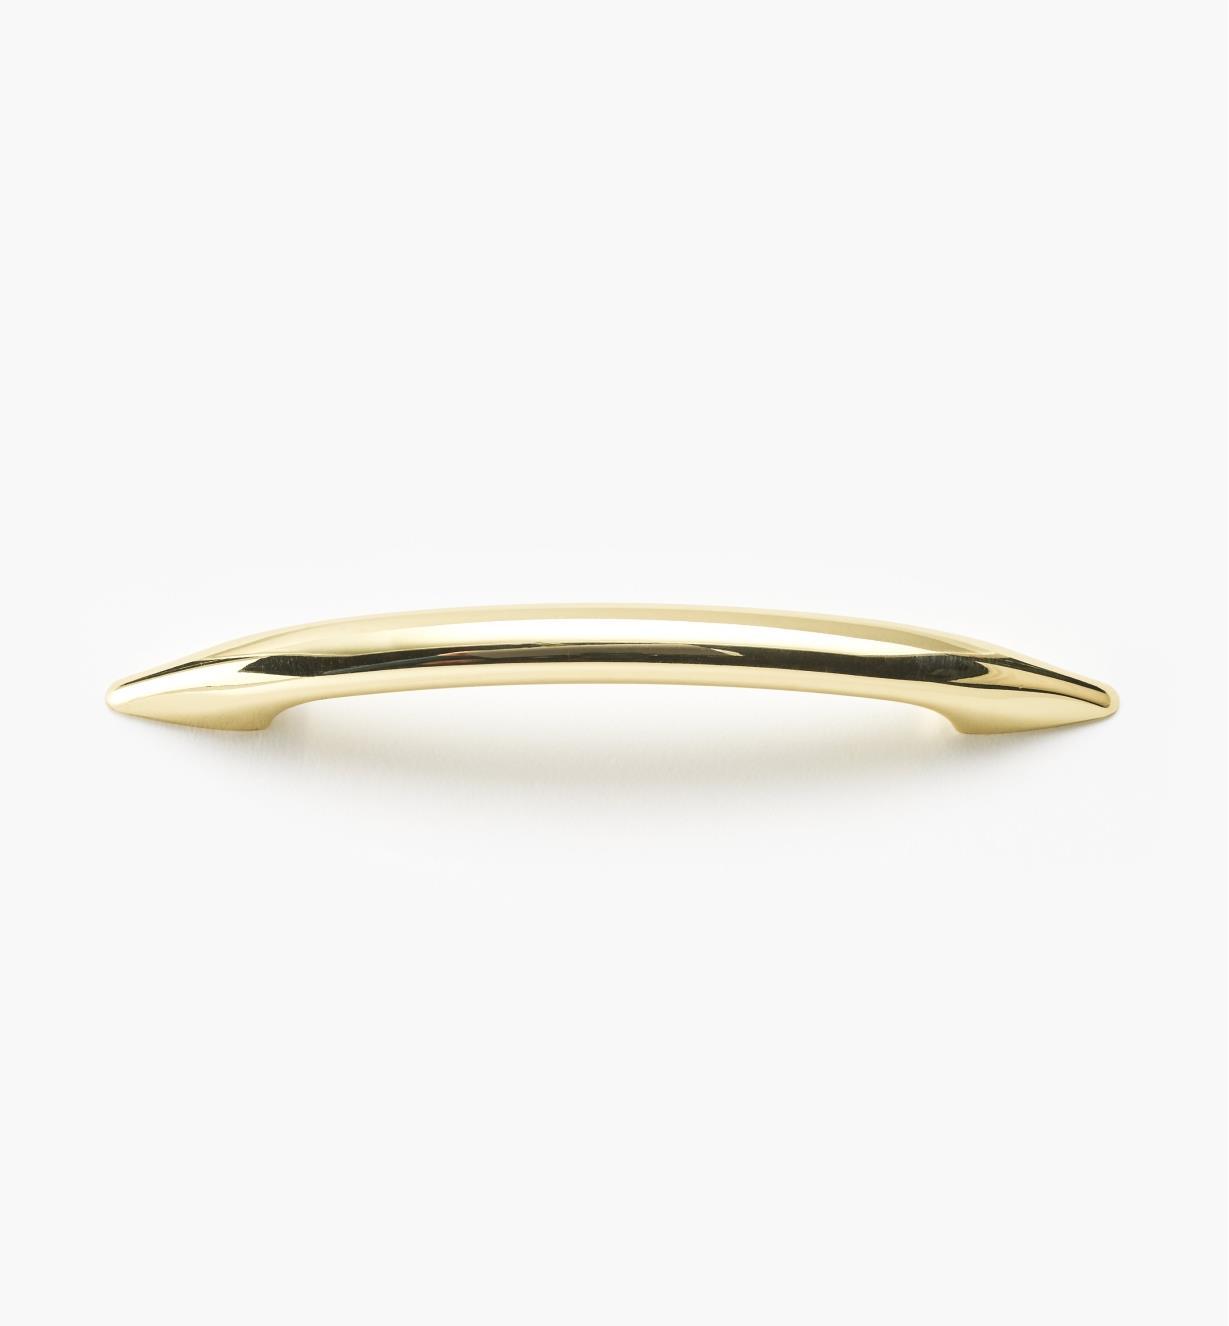 00W3115 - 96mm Brass Plate Classic Pull